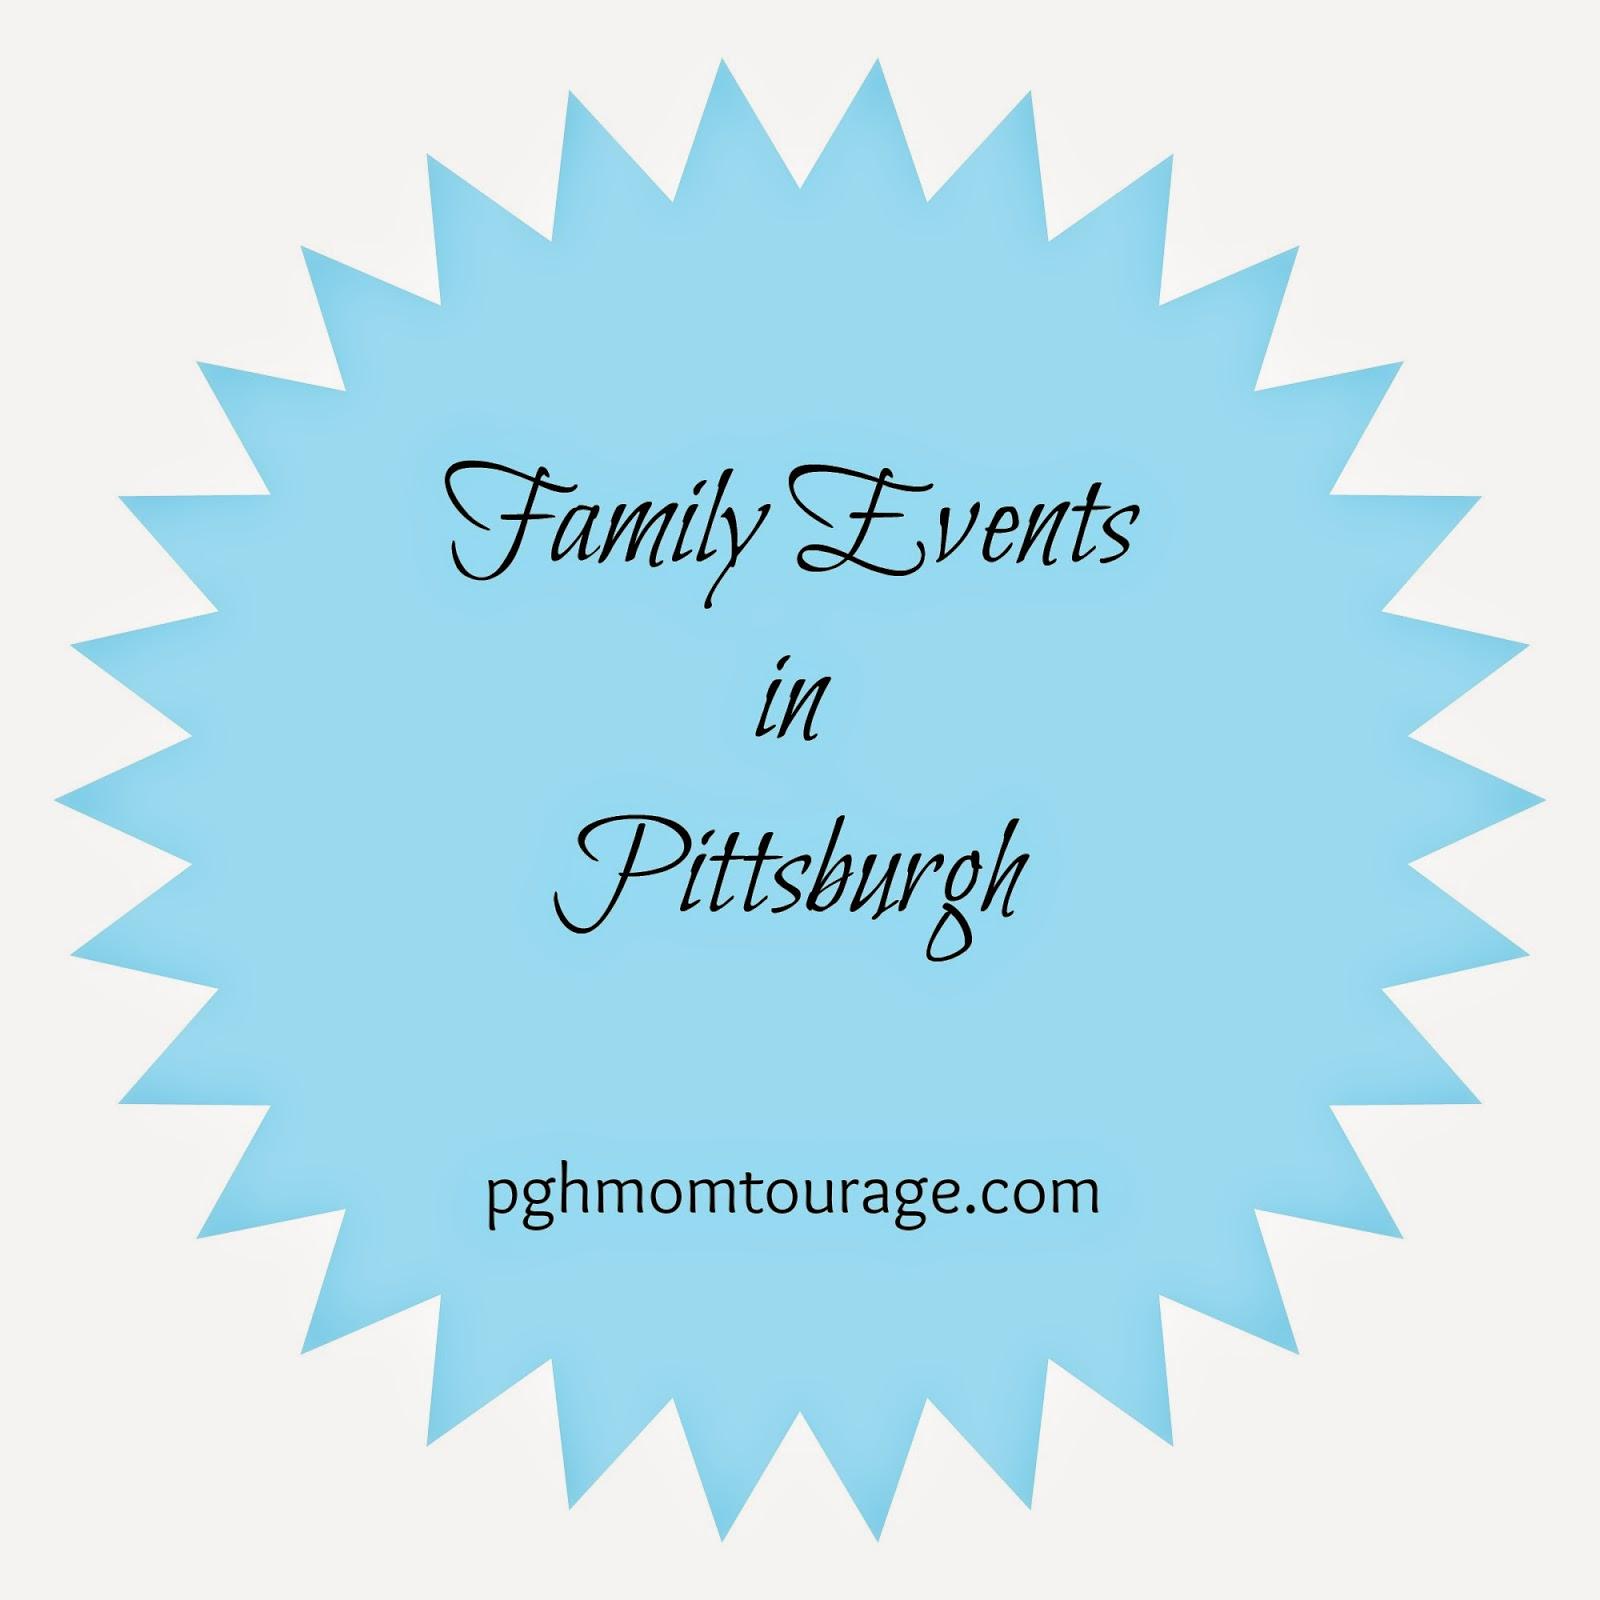 pgh momtourage pittsburgh event calendar